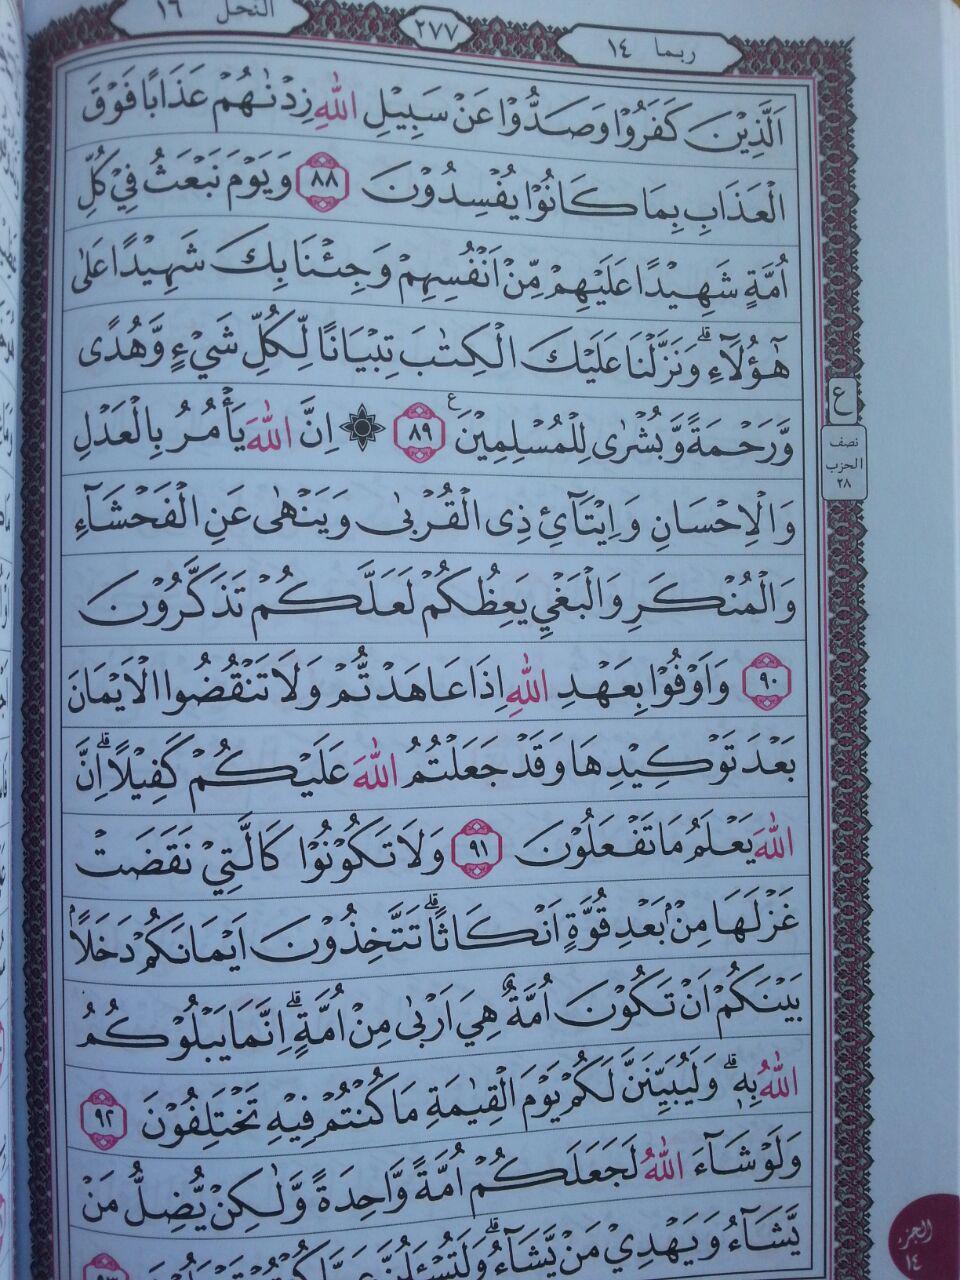 Al-Qur'an Mushaf Lamina Standar Mushaf 15 Baris Khot Utsmani B5 isi 3